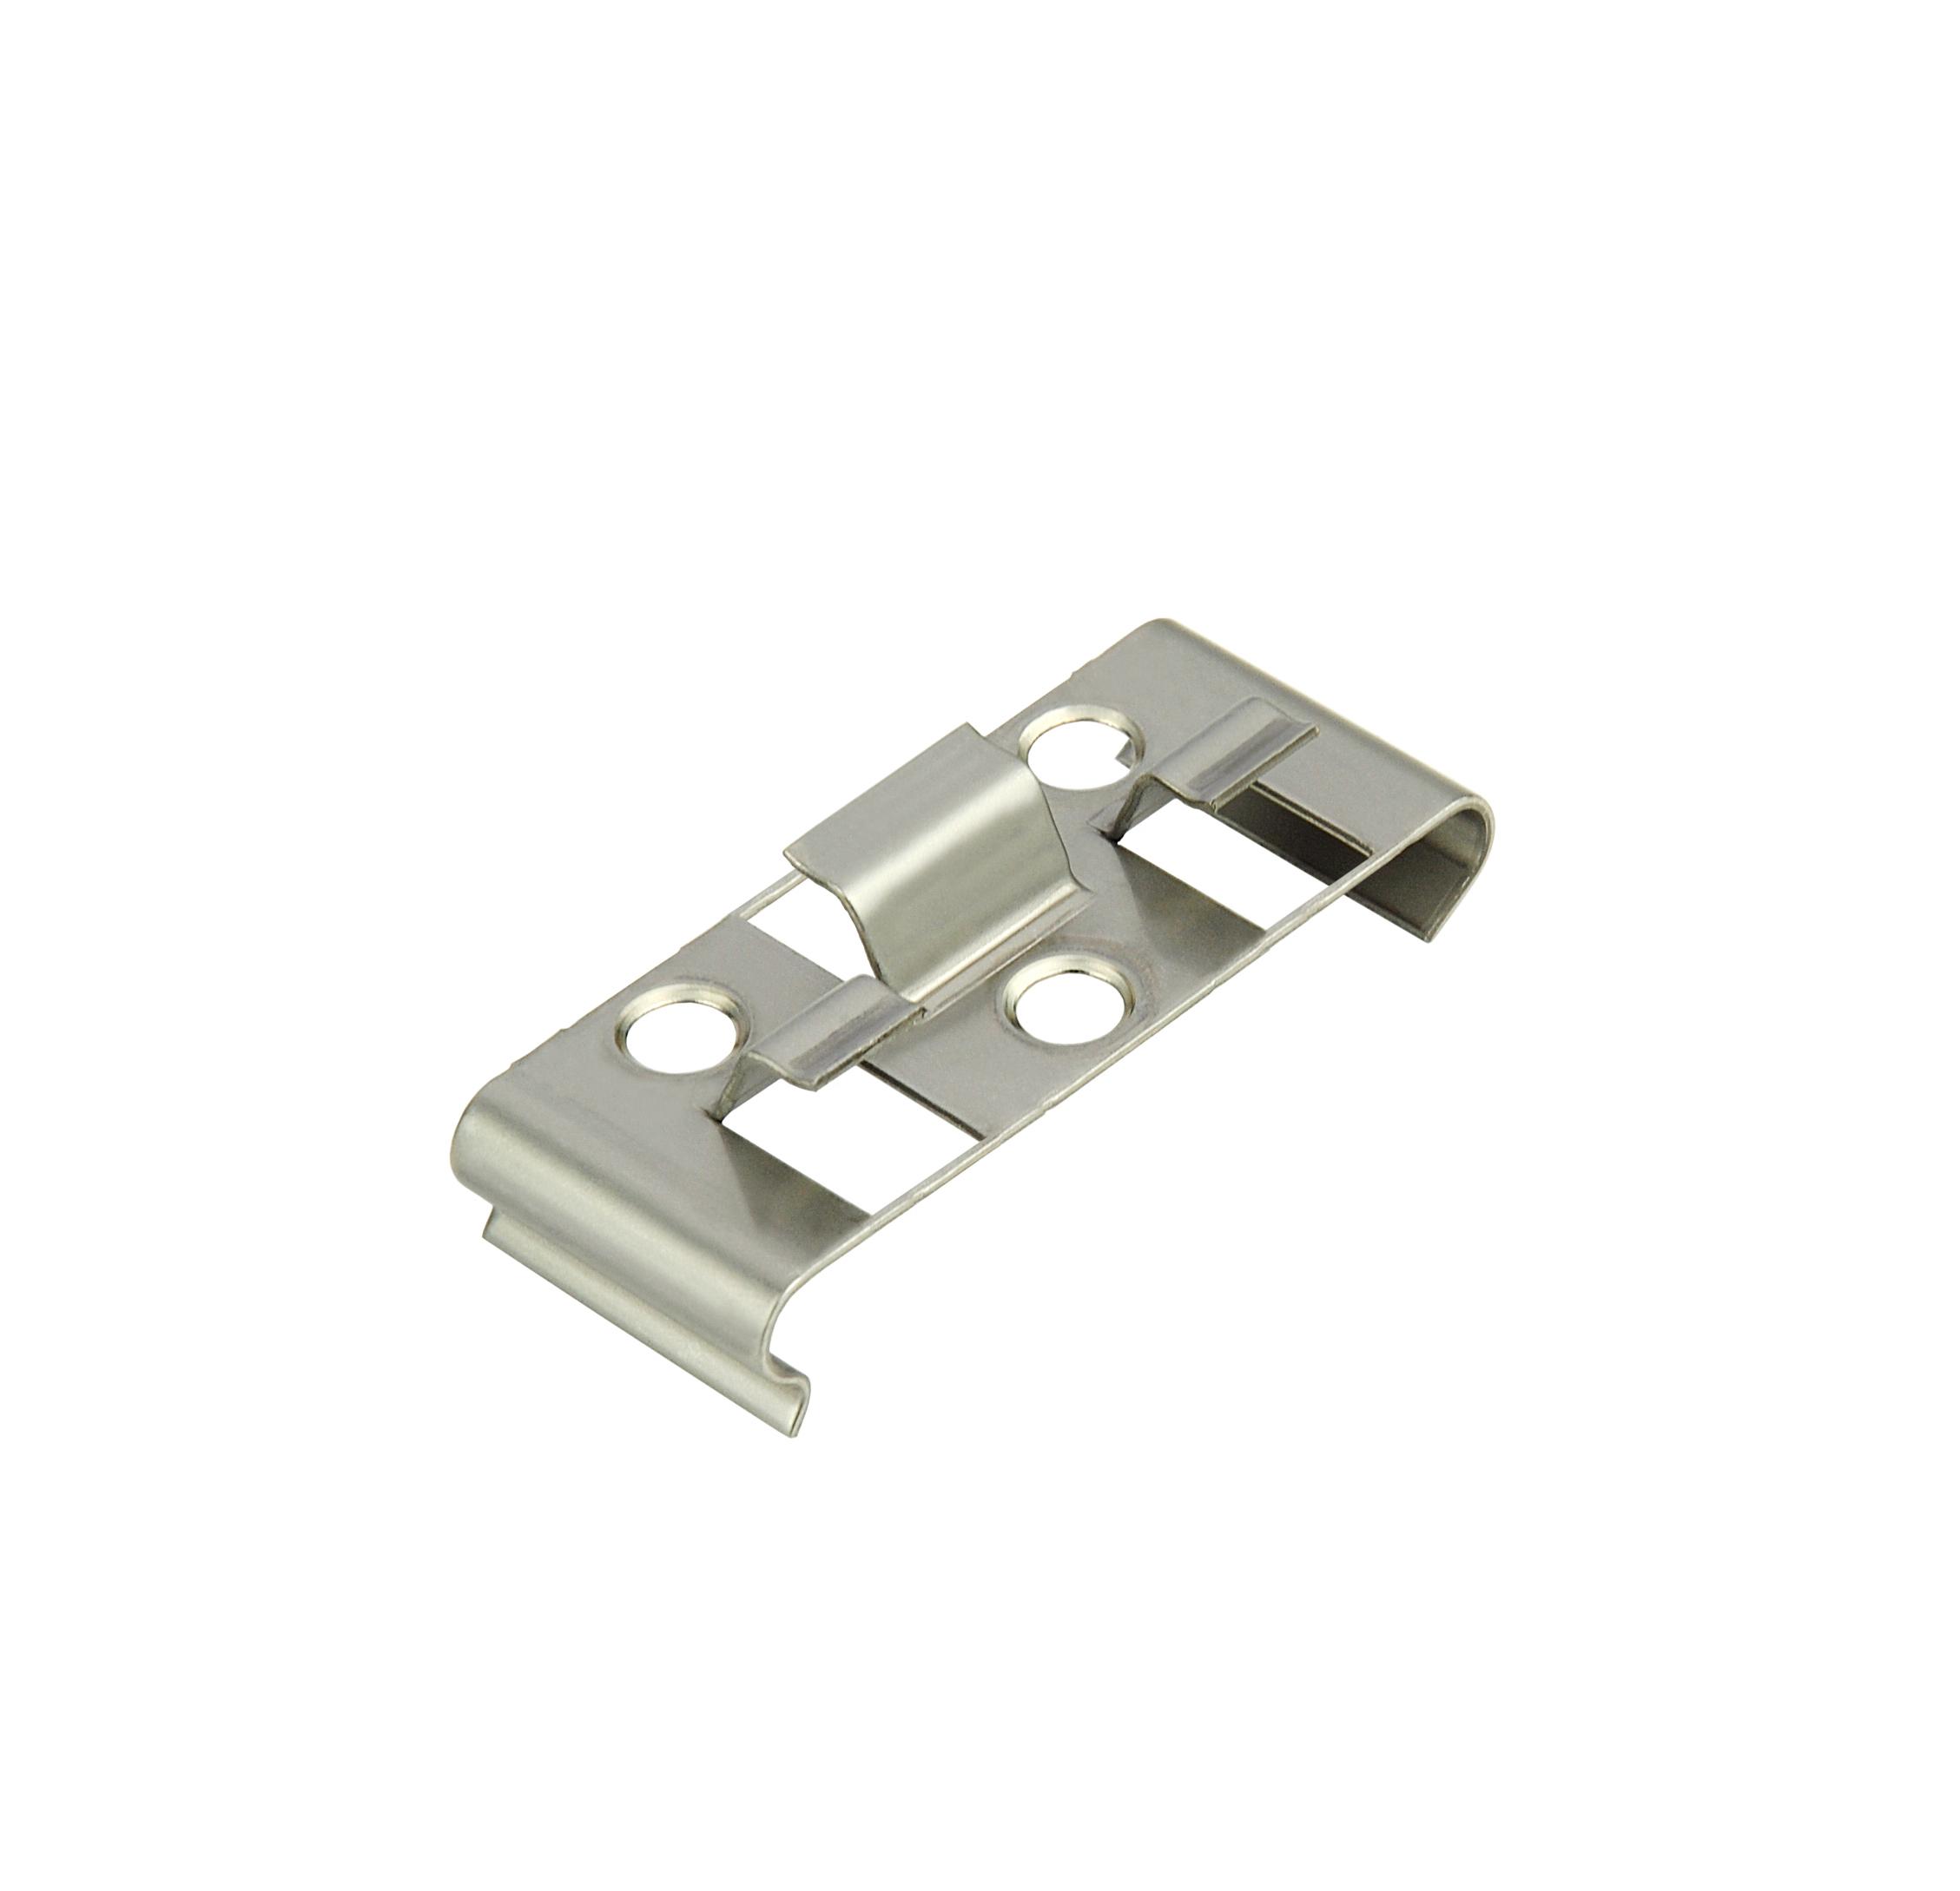 Kovalex Montageclip Boden Metall (25 Stück pro Beutel) - Edelstahl Silber